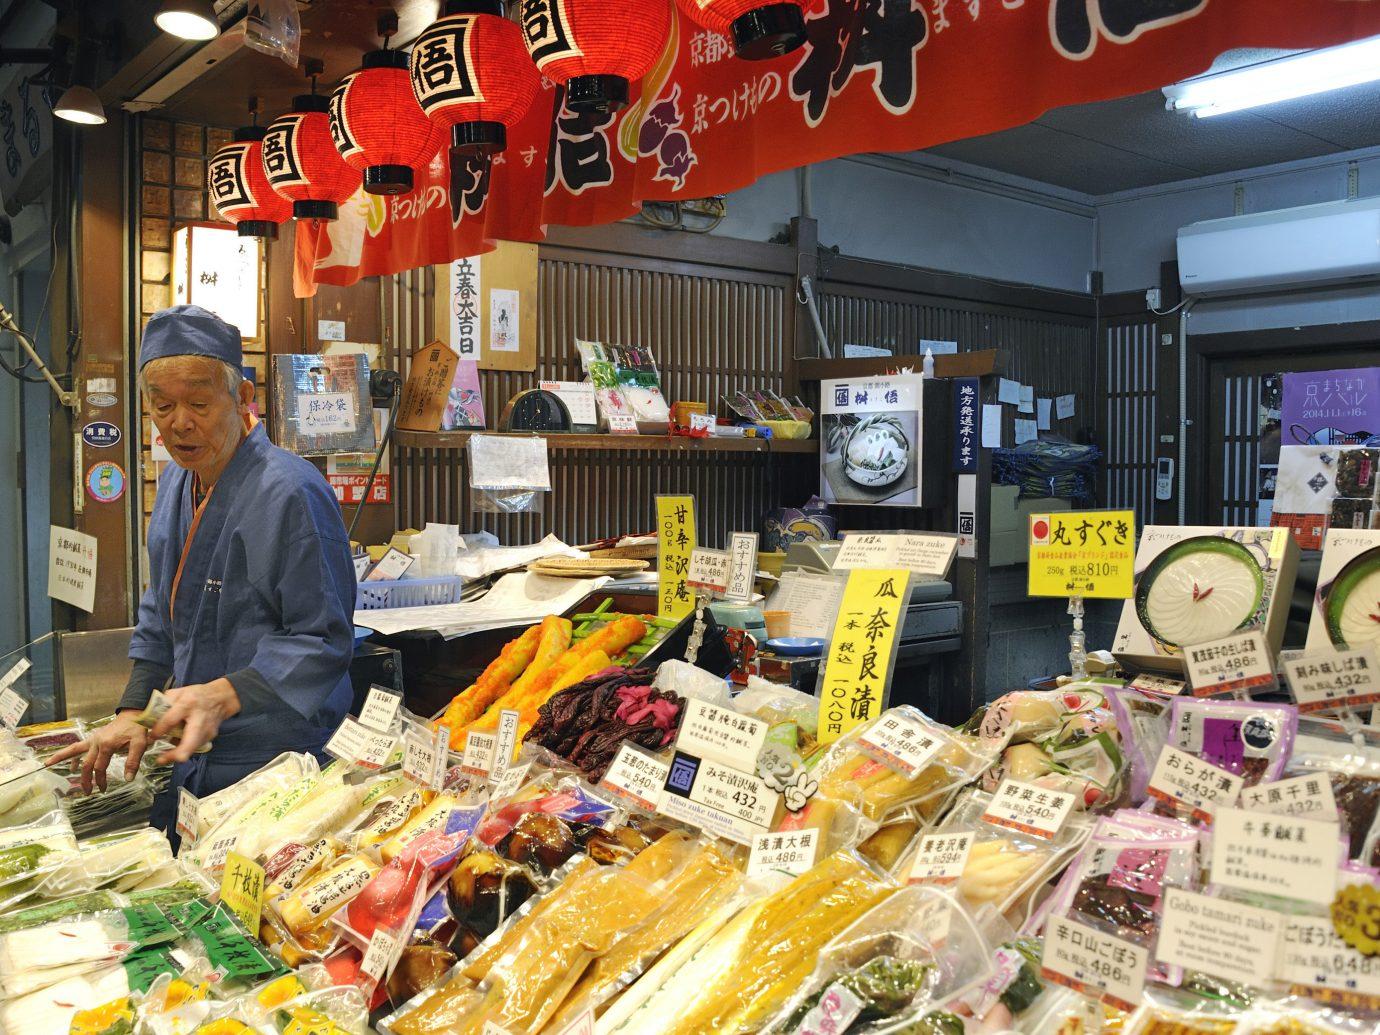 Market in Kyoto, Japan